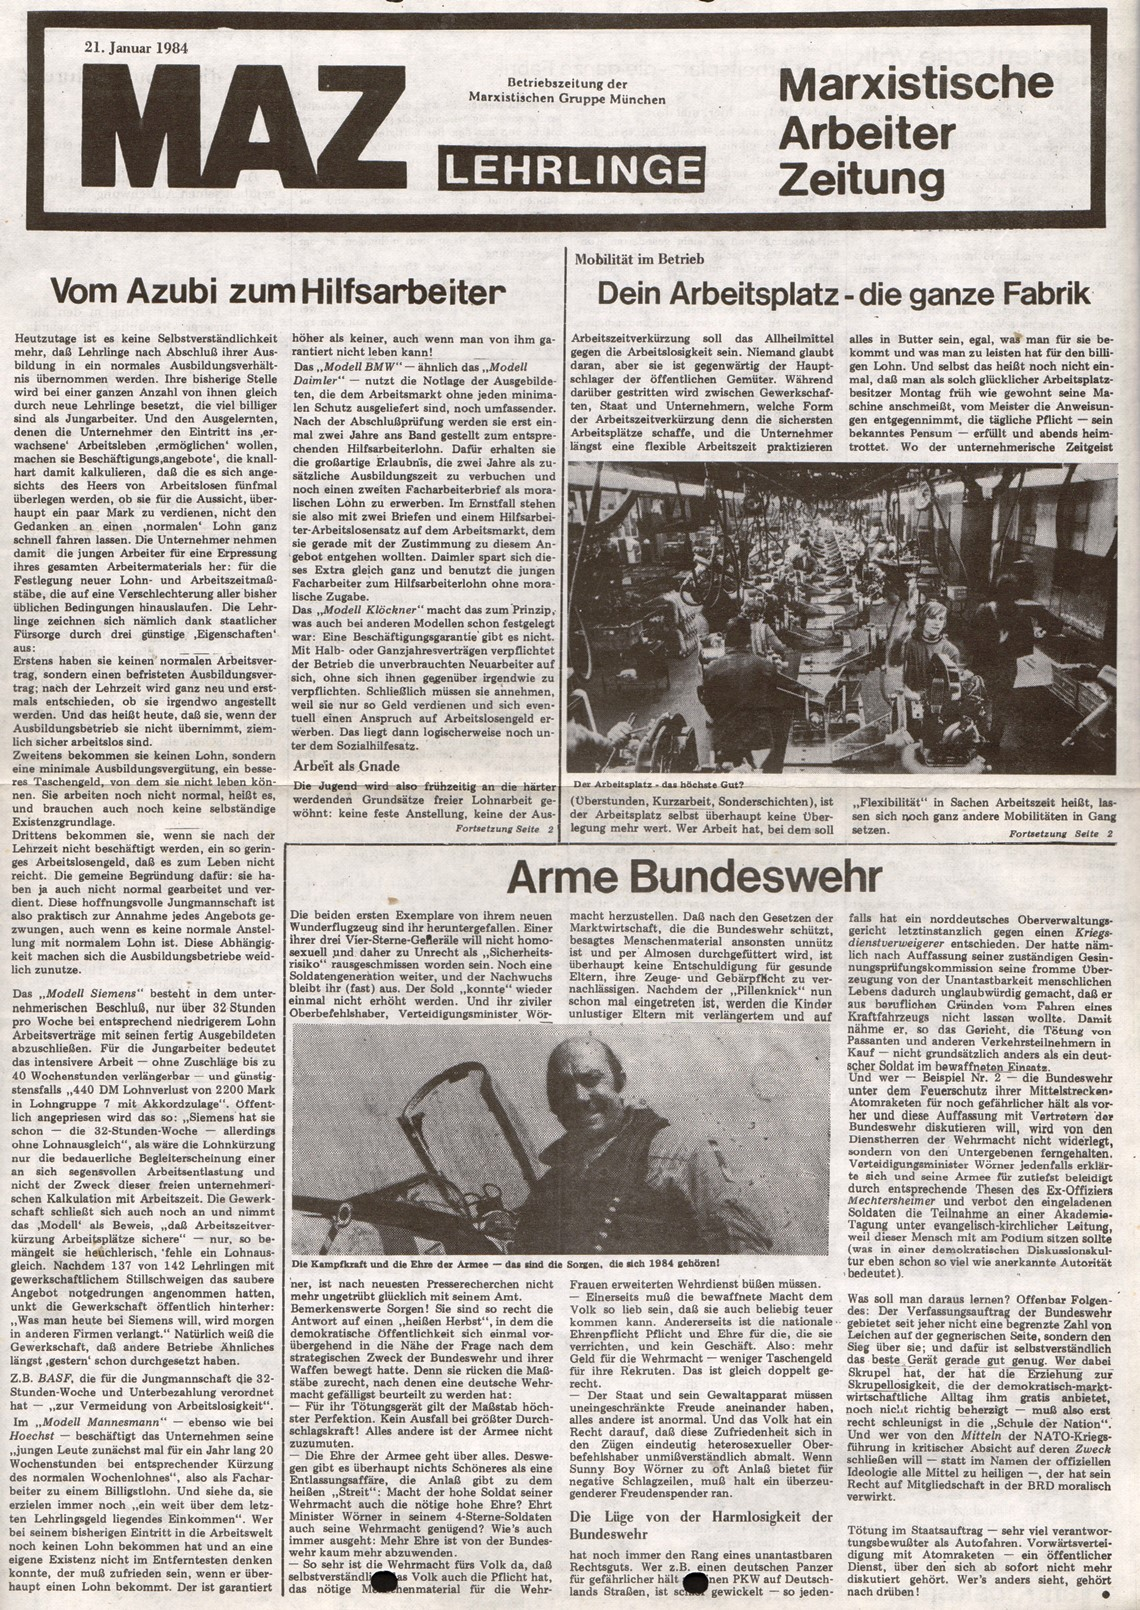 Muenchen_MG_MAZ_Lehrlinge_19840121_01